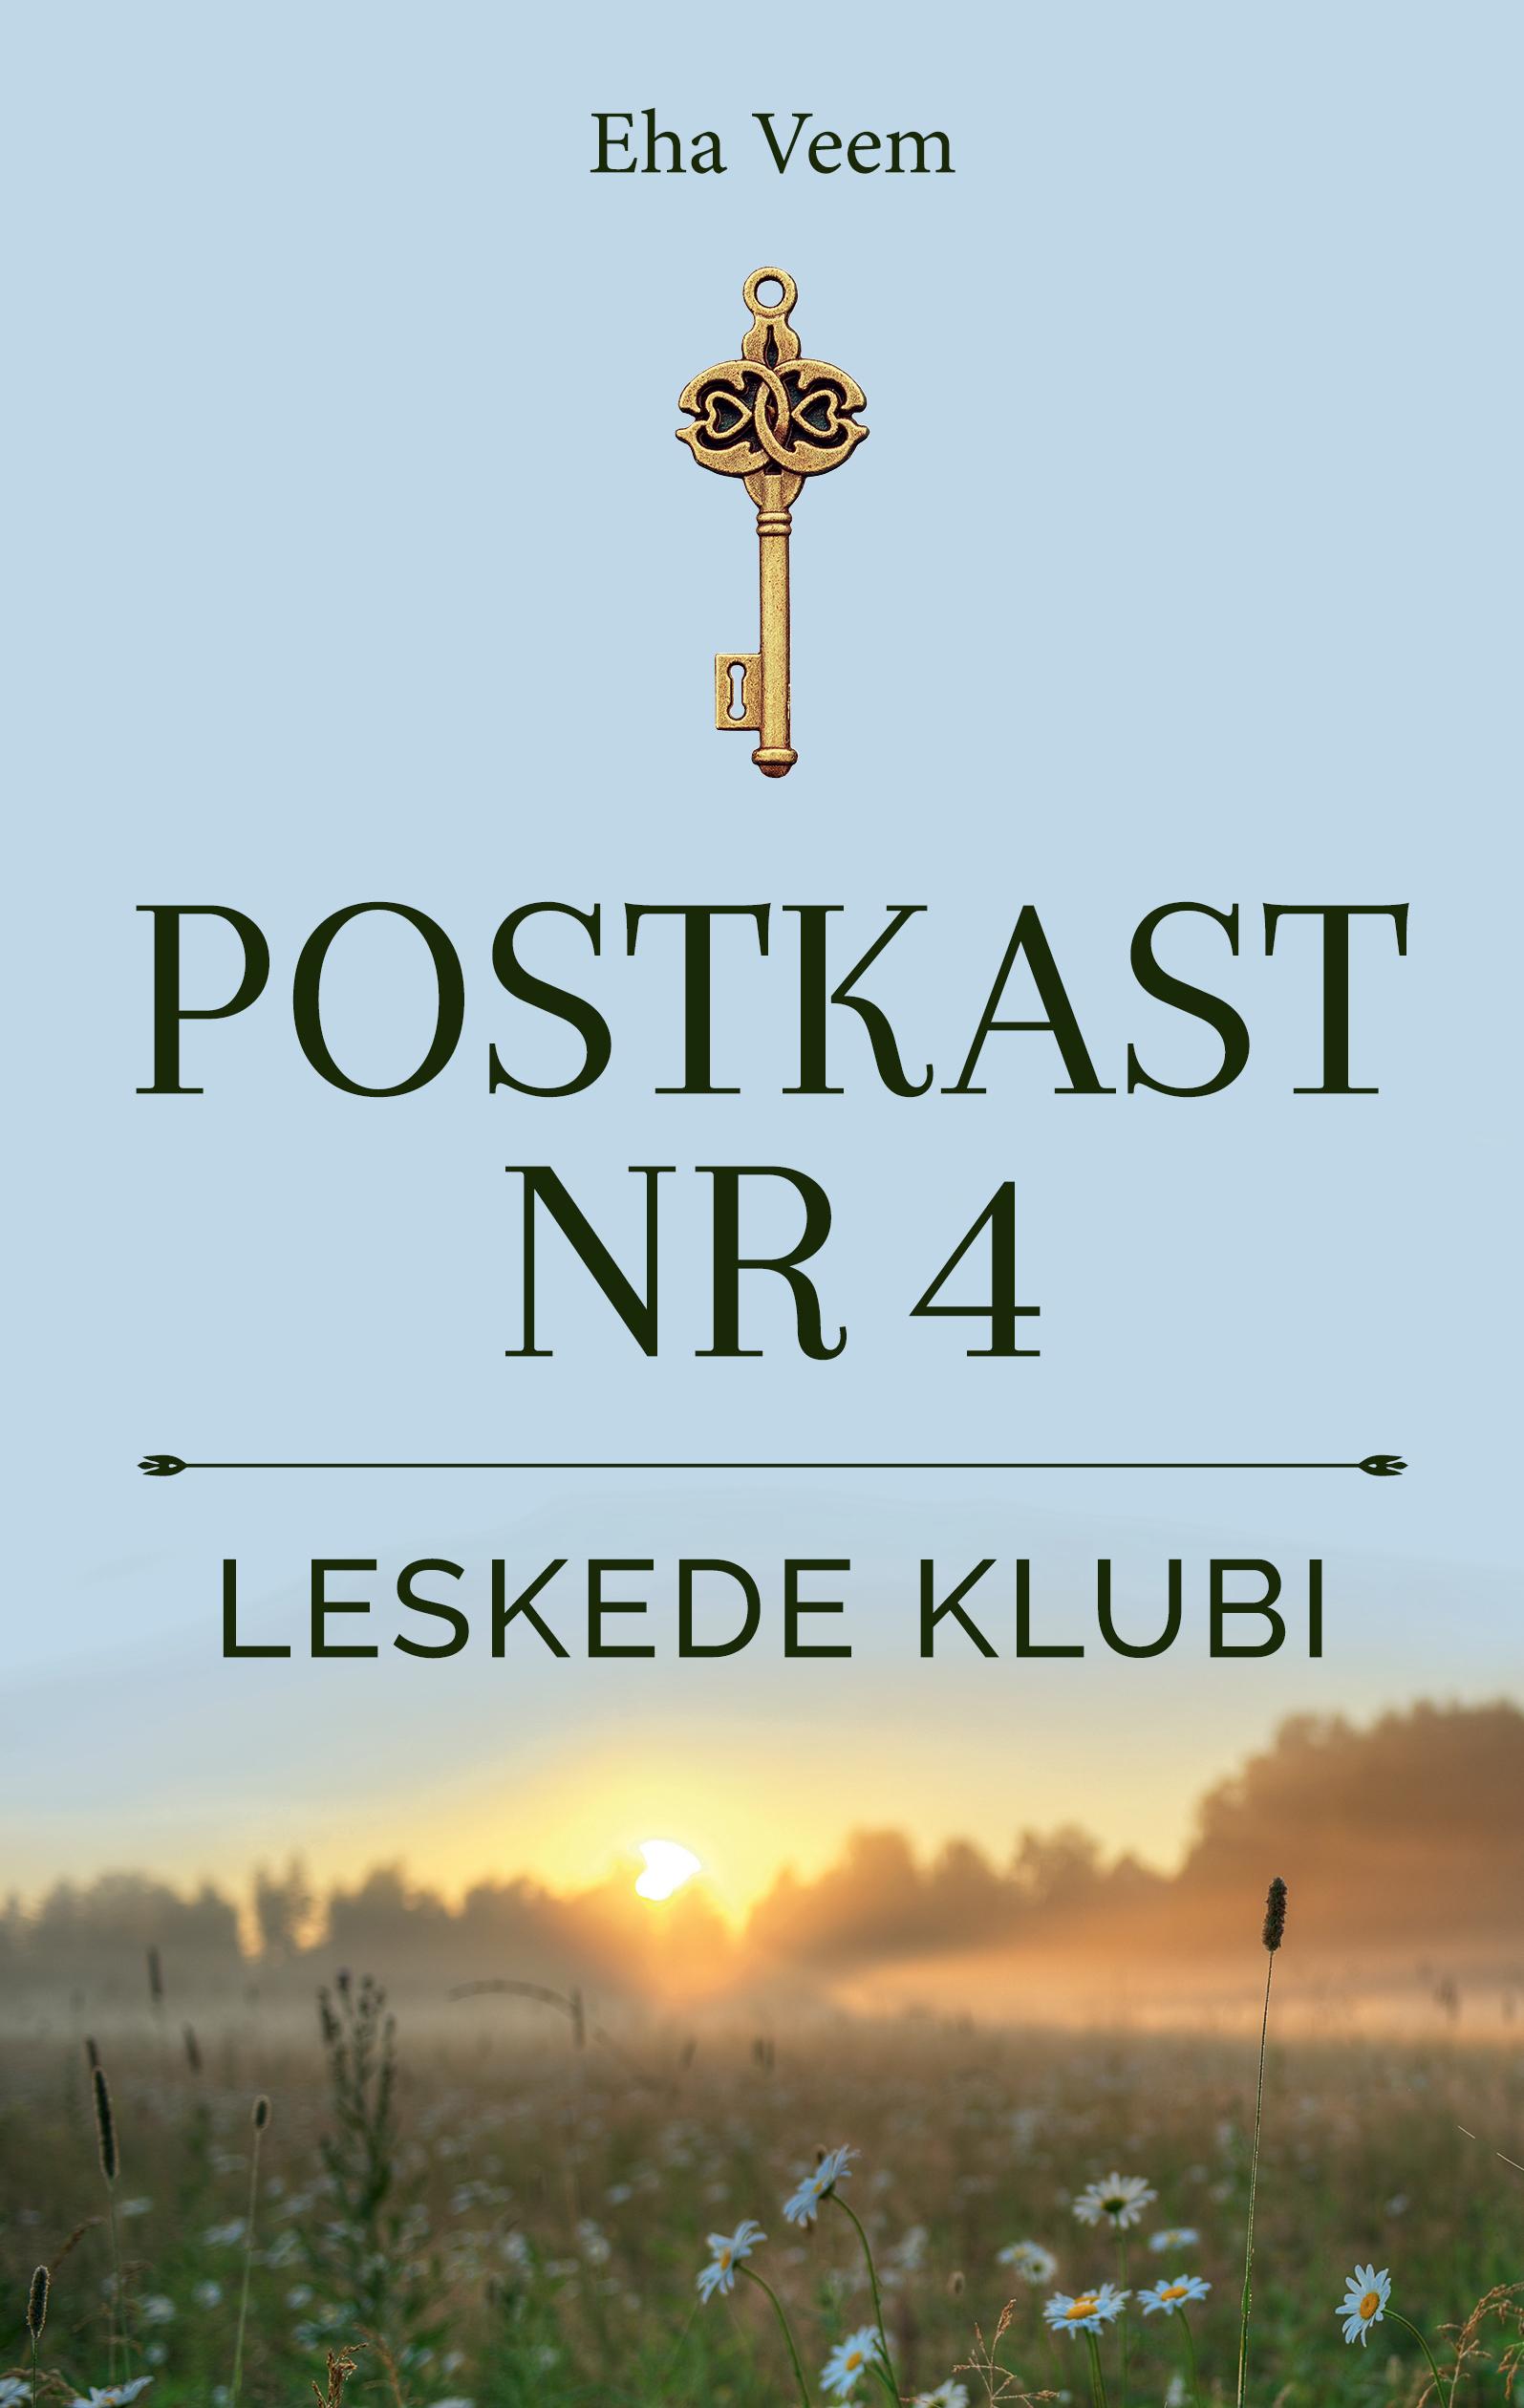 лучшая цена Eha Veem Postkast nr 4. Leskede klubi